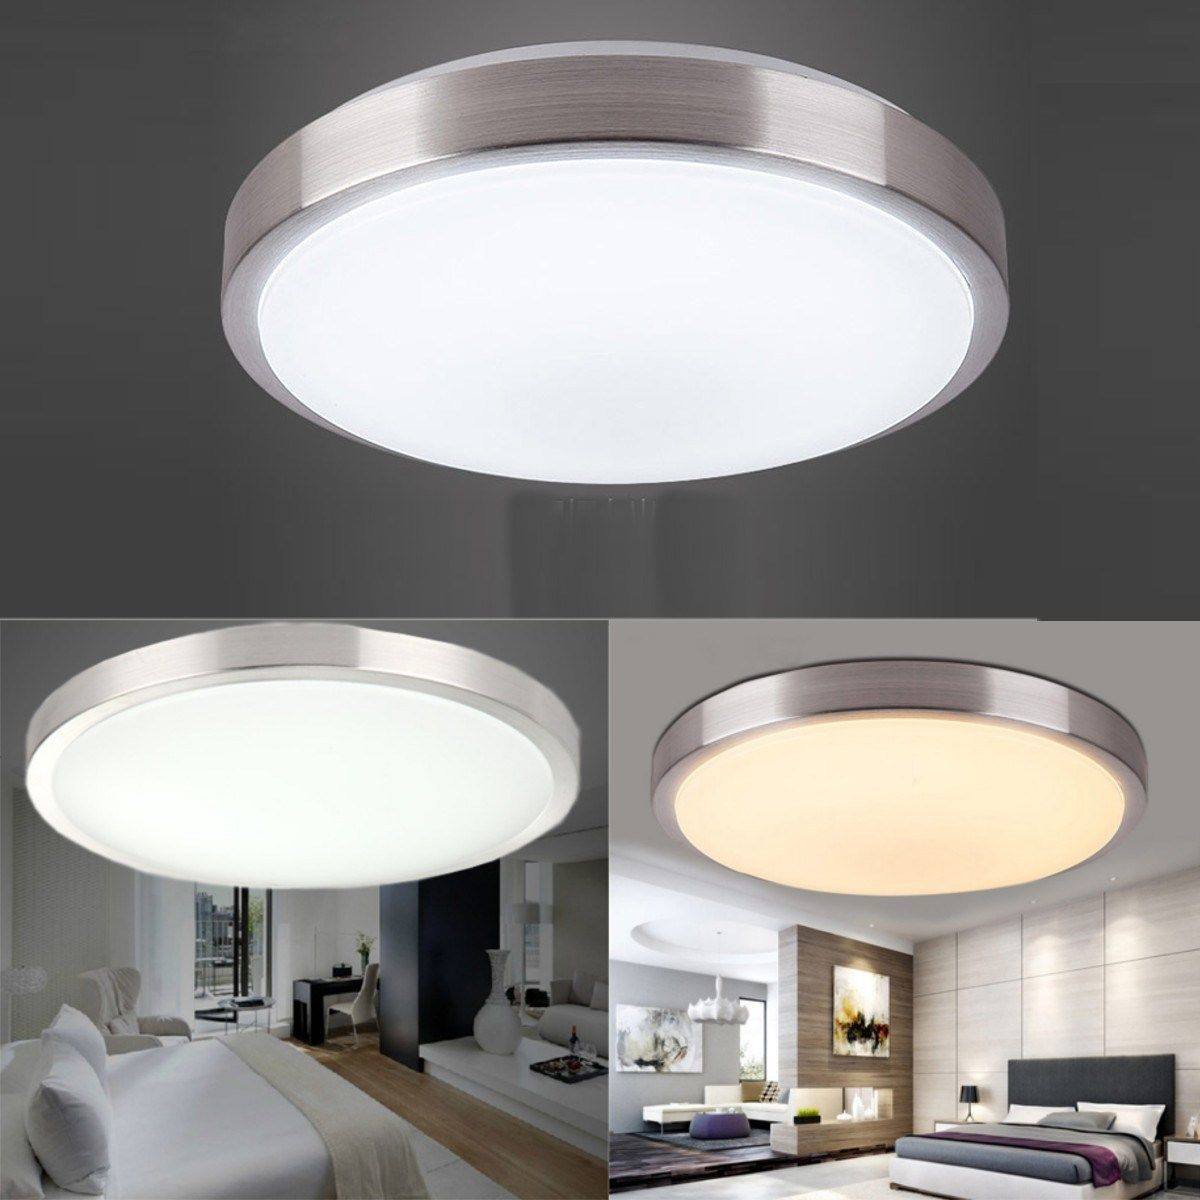 Bathroom Down Lighting Alcove Asewin Led Ceiling Lightsmodern Led